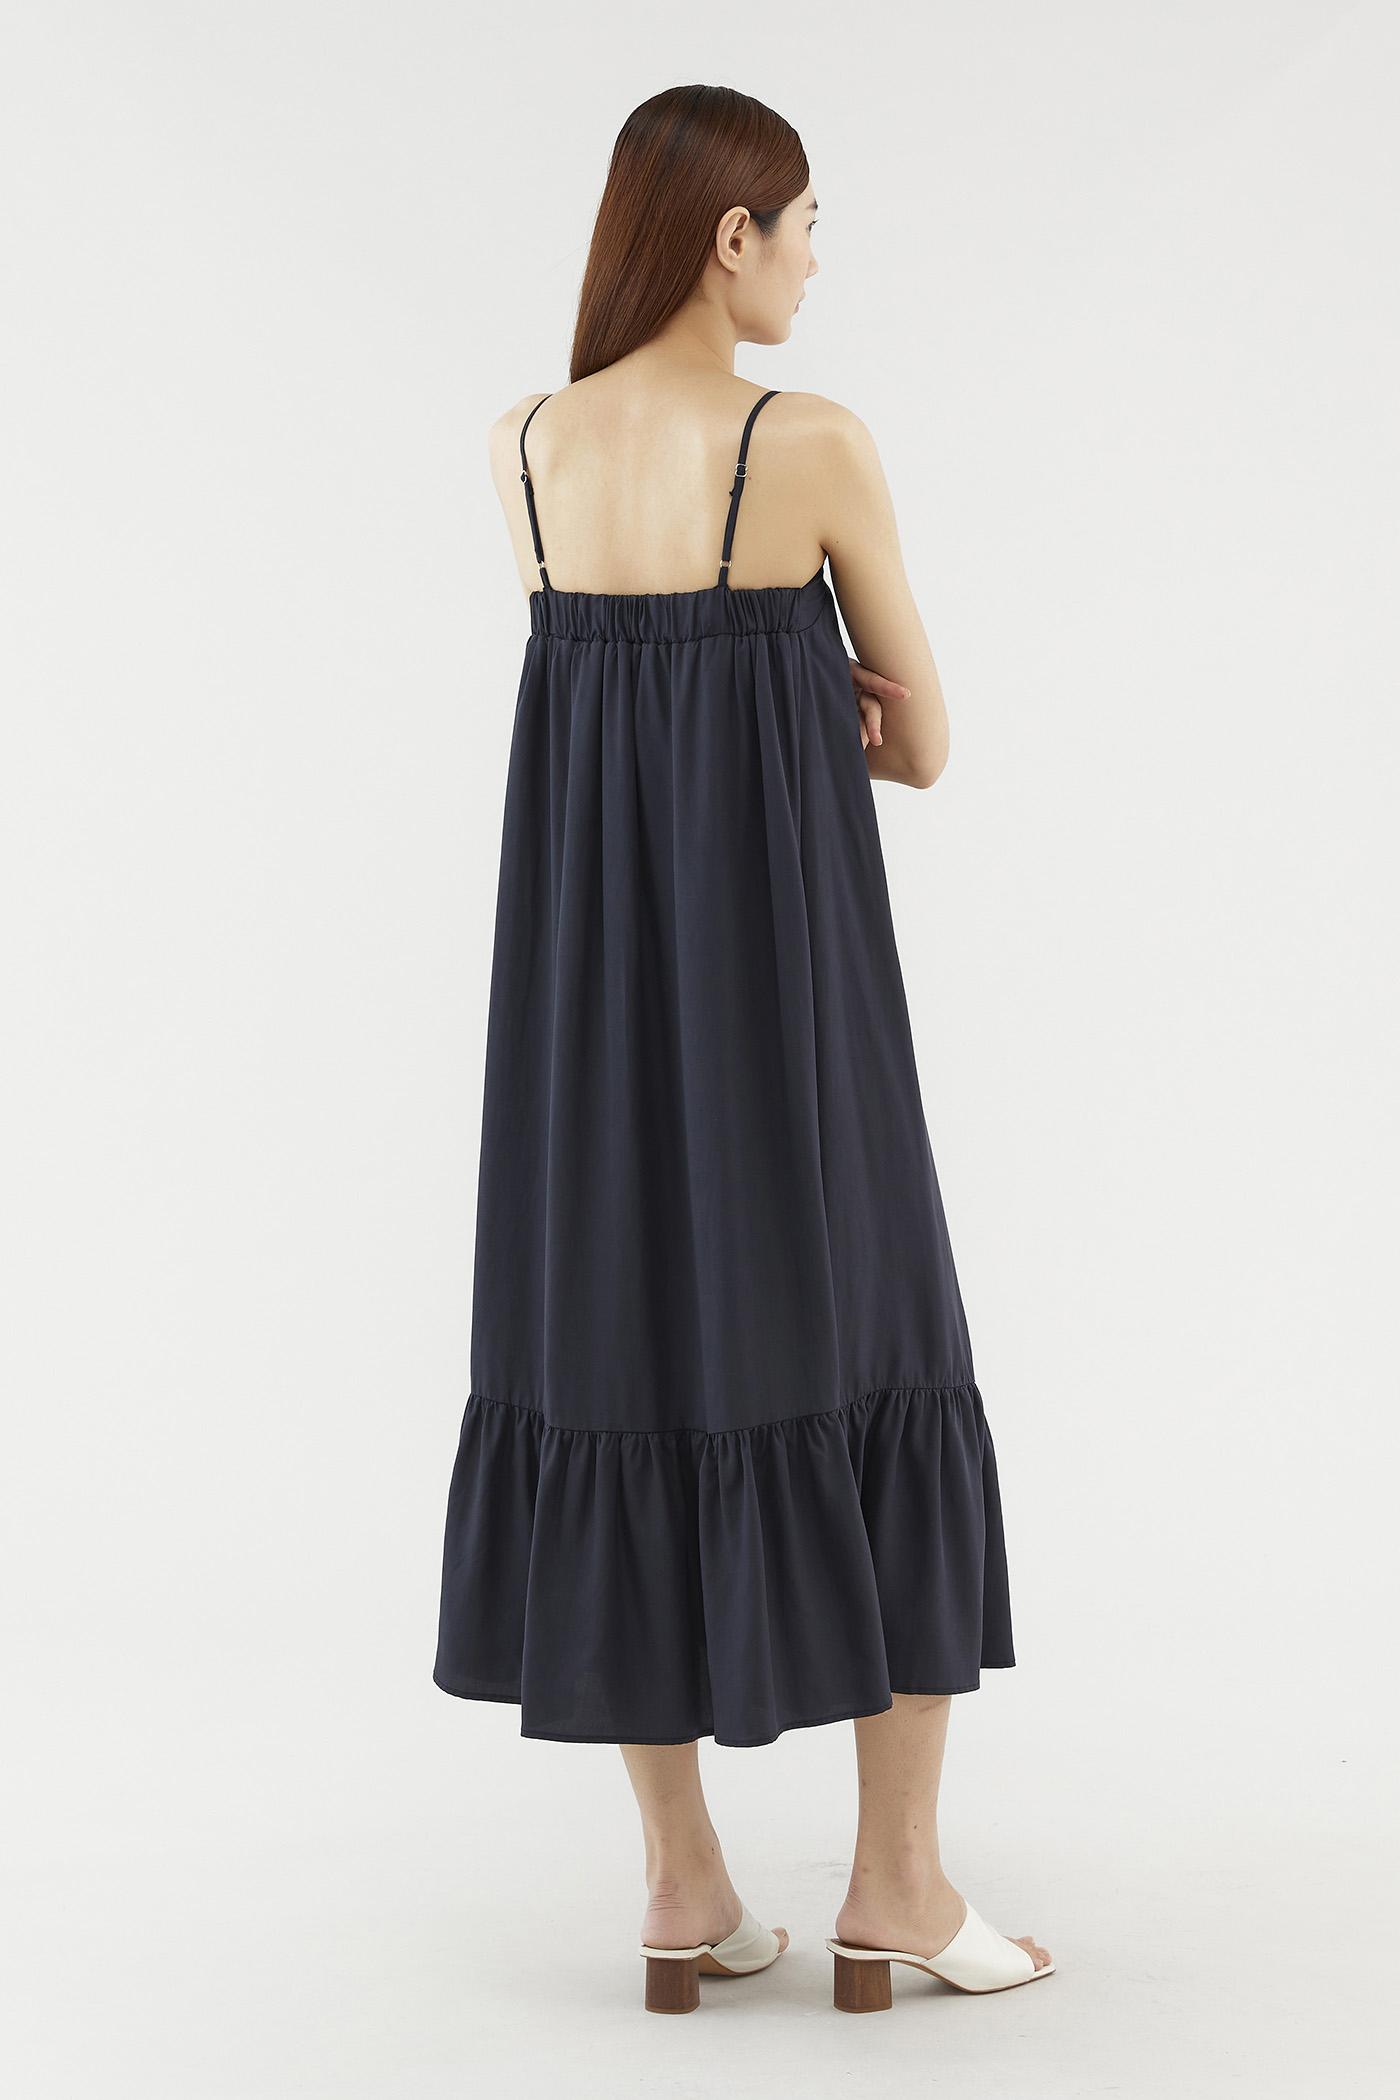 Chelcie Frill-hem Dress